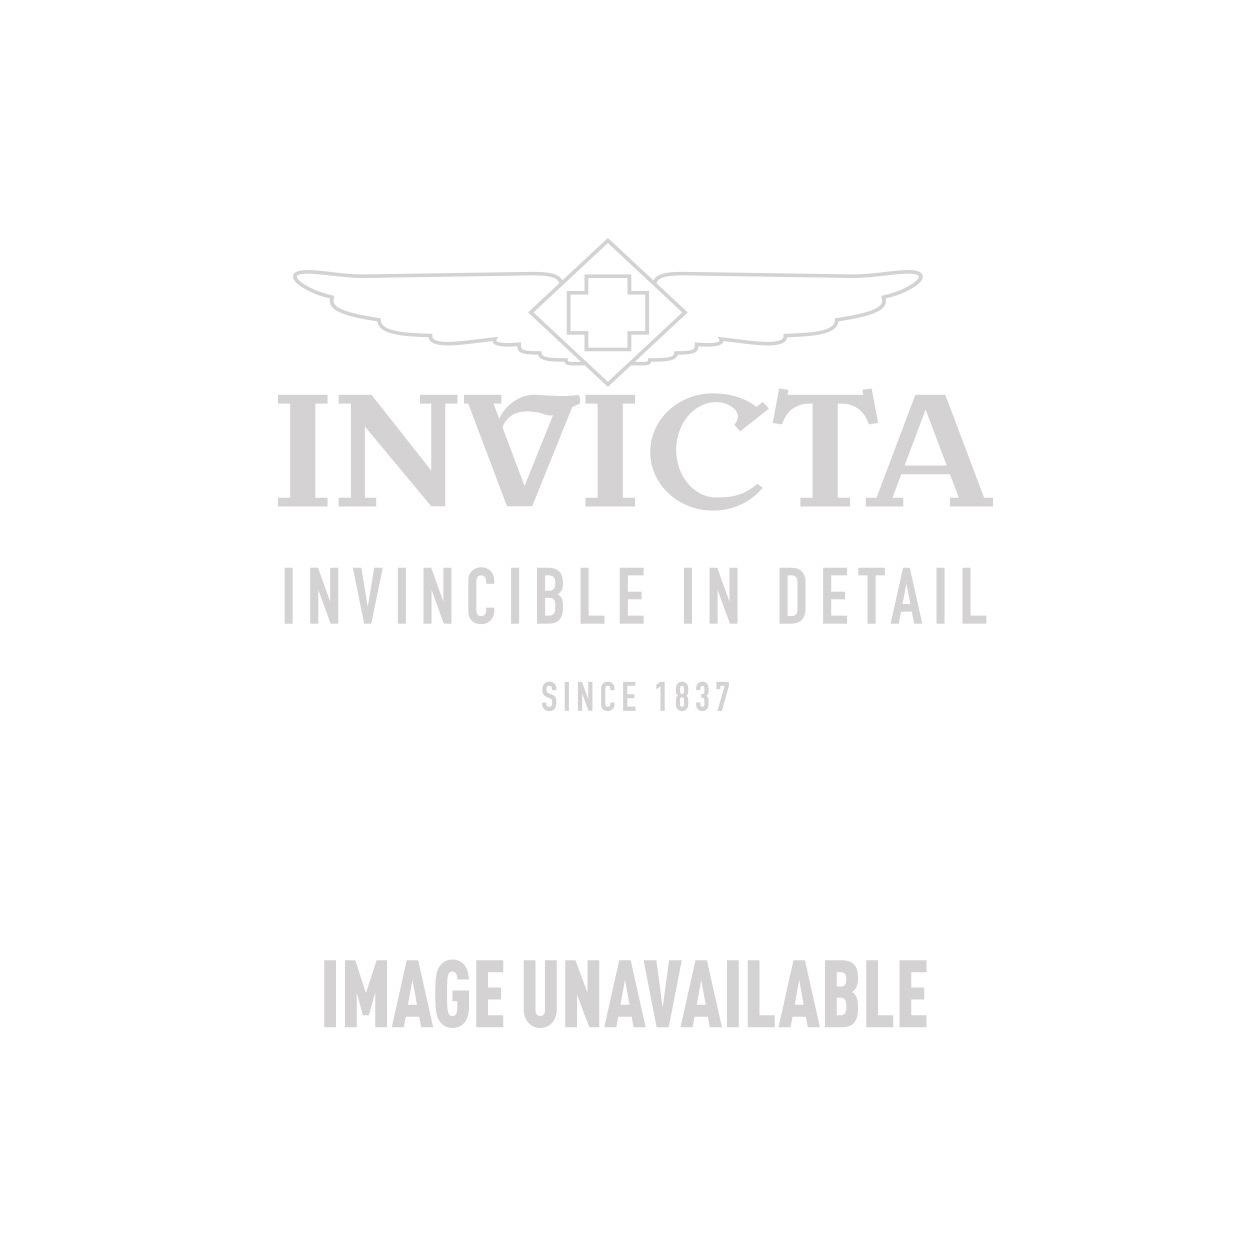 Invicta Akula Swiss Made Quartz Watch - Black case Stainless Steel band - Model 11932